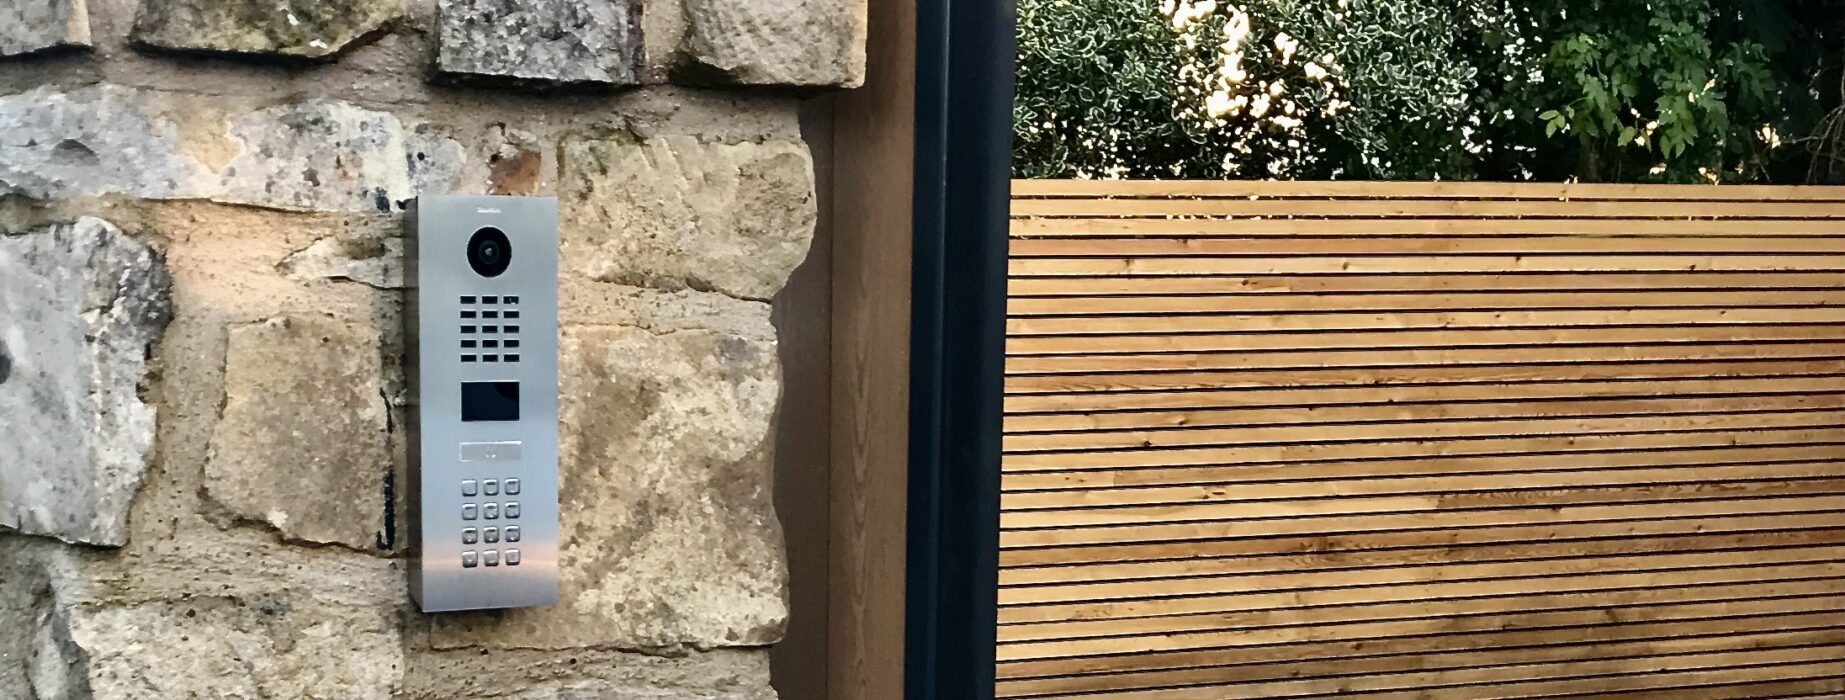 AES (SCOTLAND) LTD installed DoorBird Intercom